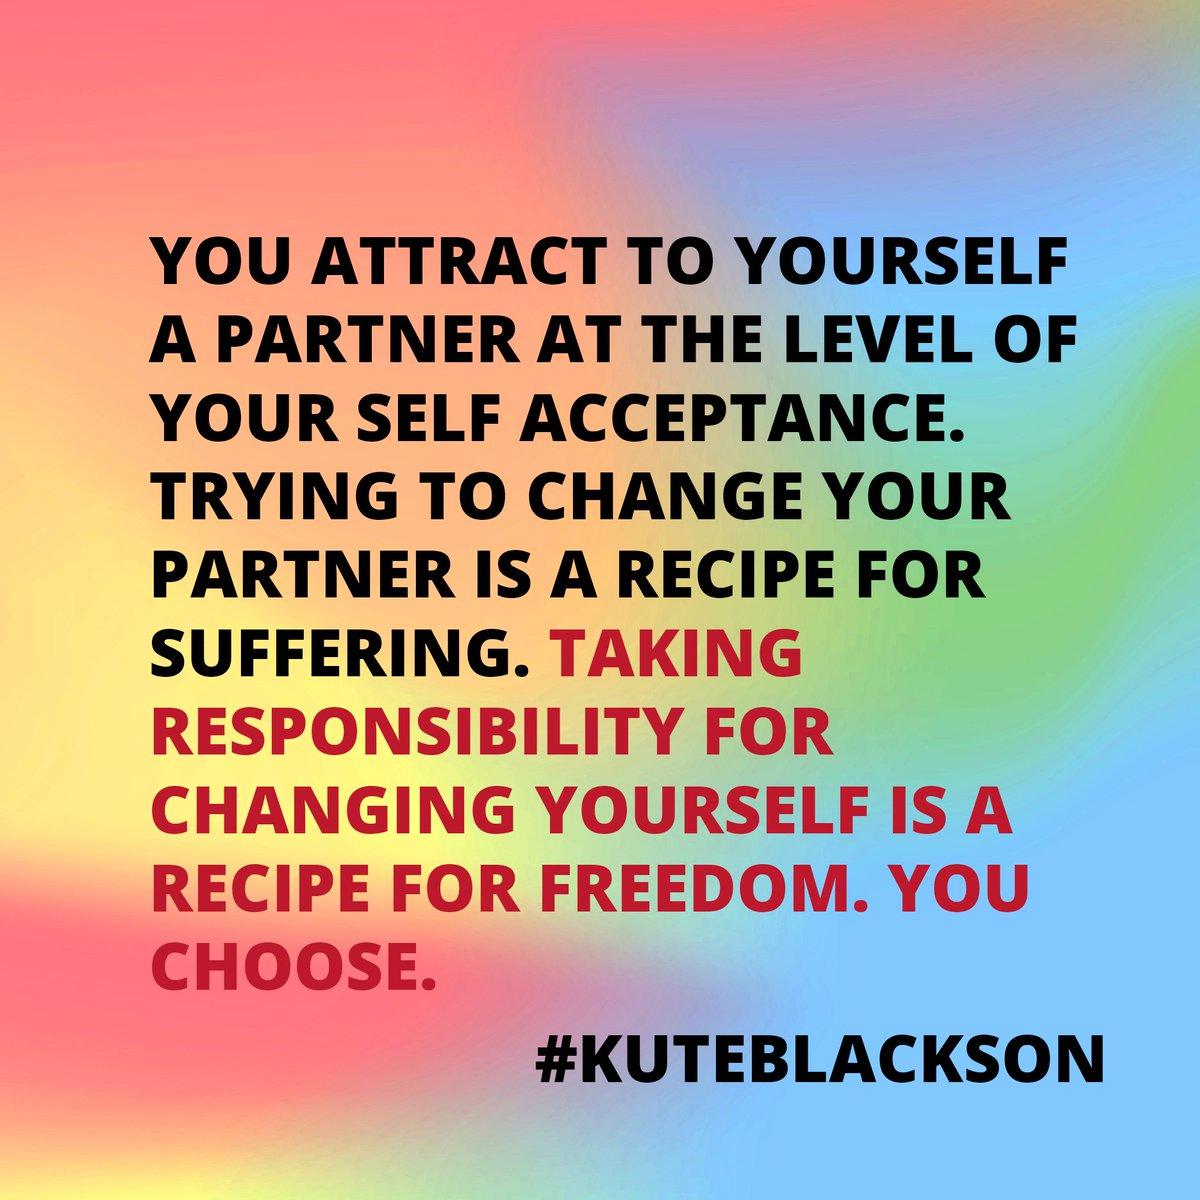 #kuteblackson#lovenow#motivational#inspire#motivate#inspirational#happiness#success#dailyquote#quotes#quotestoliveby#qotd #life https://t.co/RRD2nEl7dn